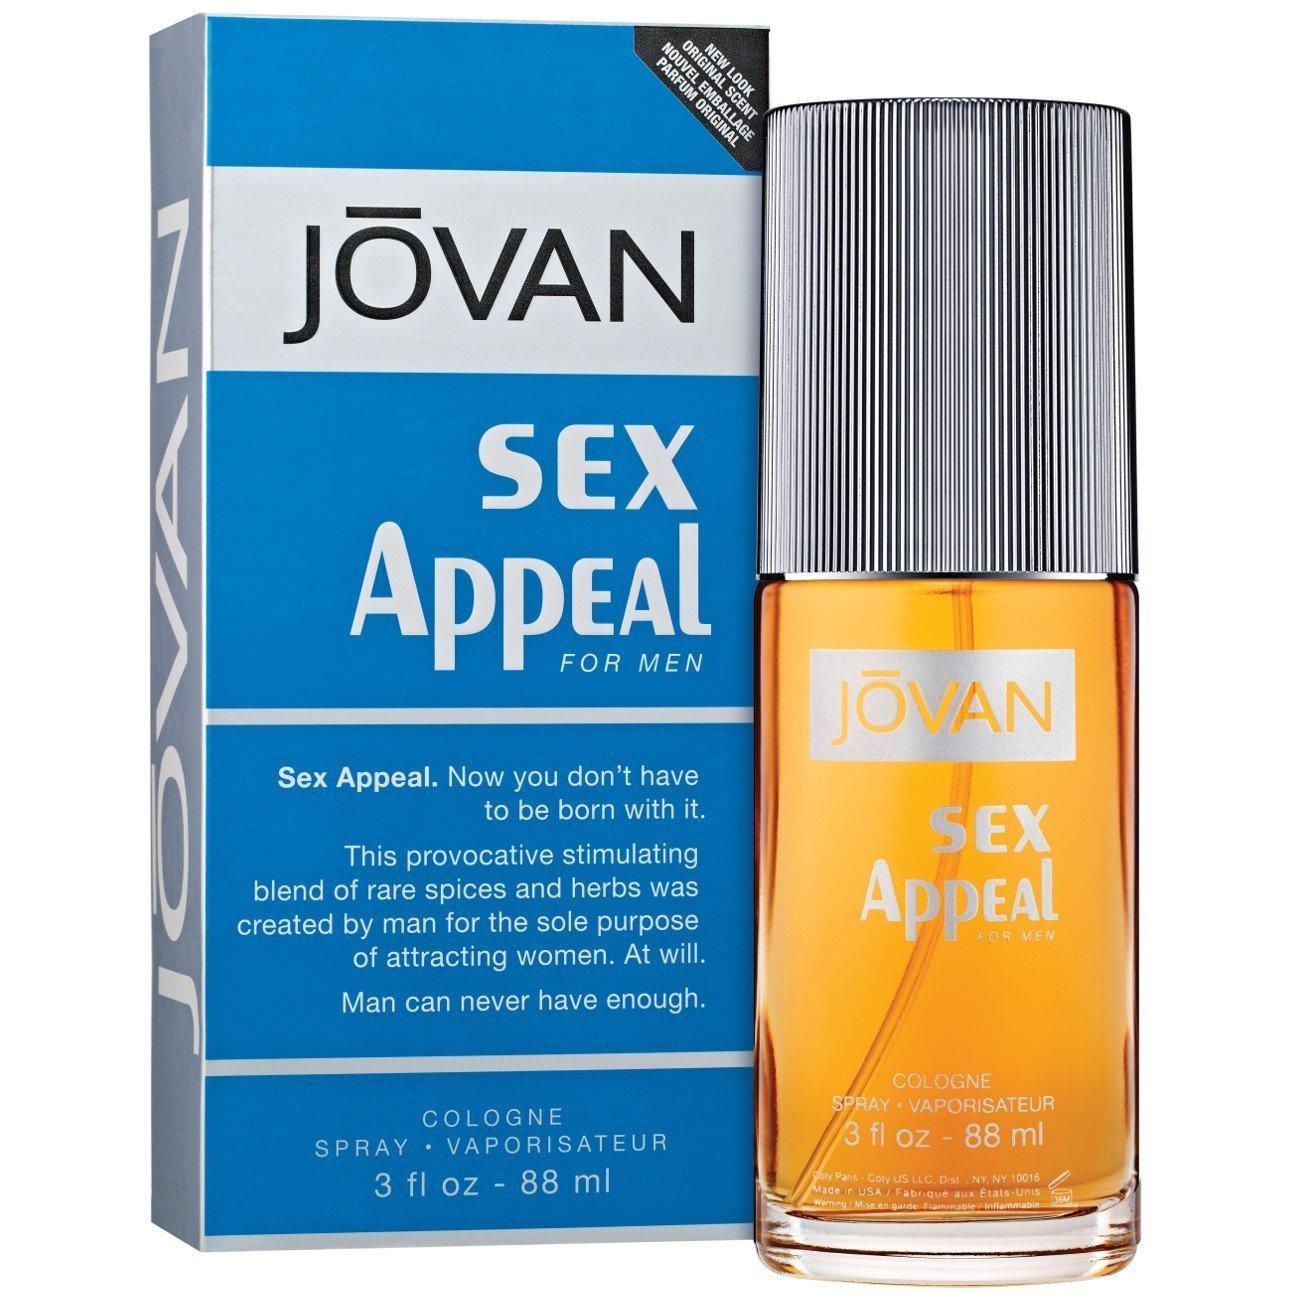 Perfume Jovan Sex Appeal Cologne Spray 88ml Spray Caballero